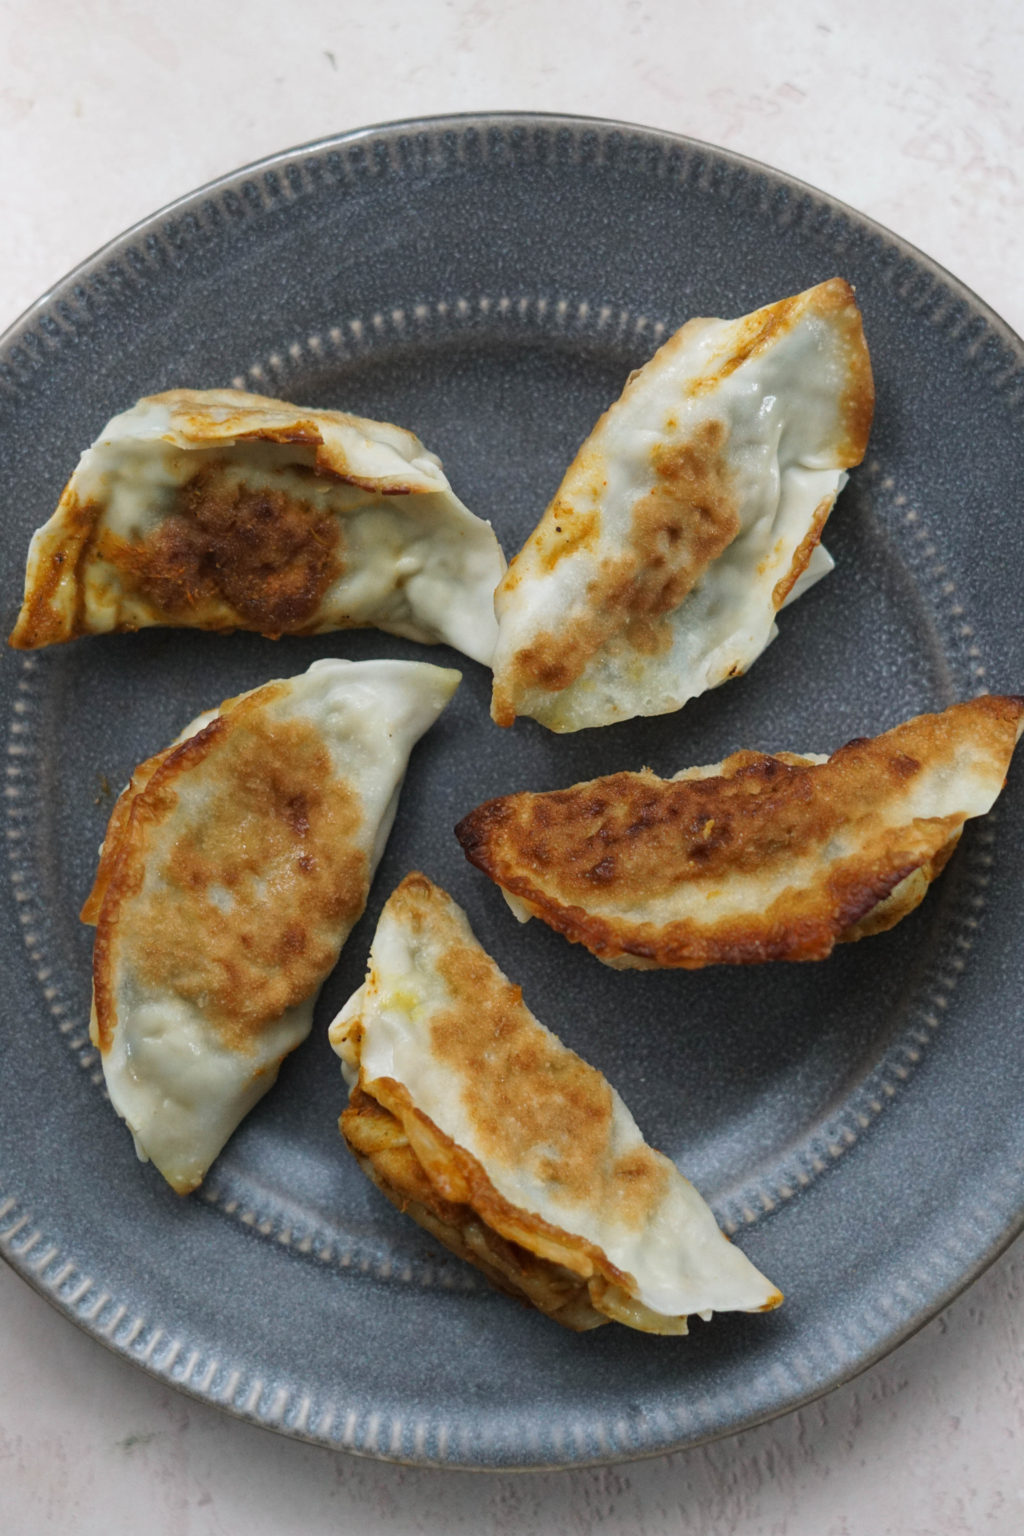 Five pan fried paneer momos on a gray plate.